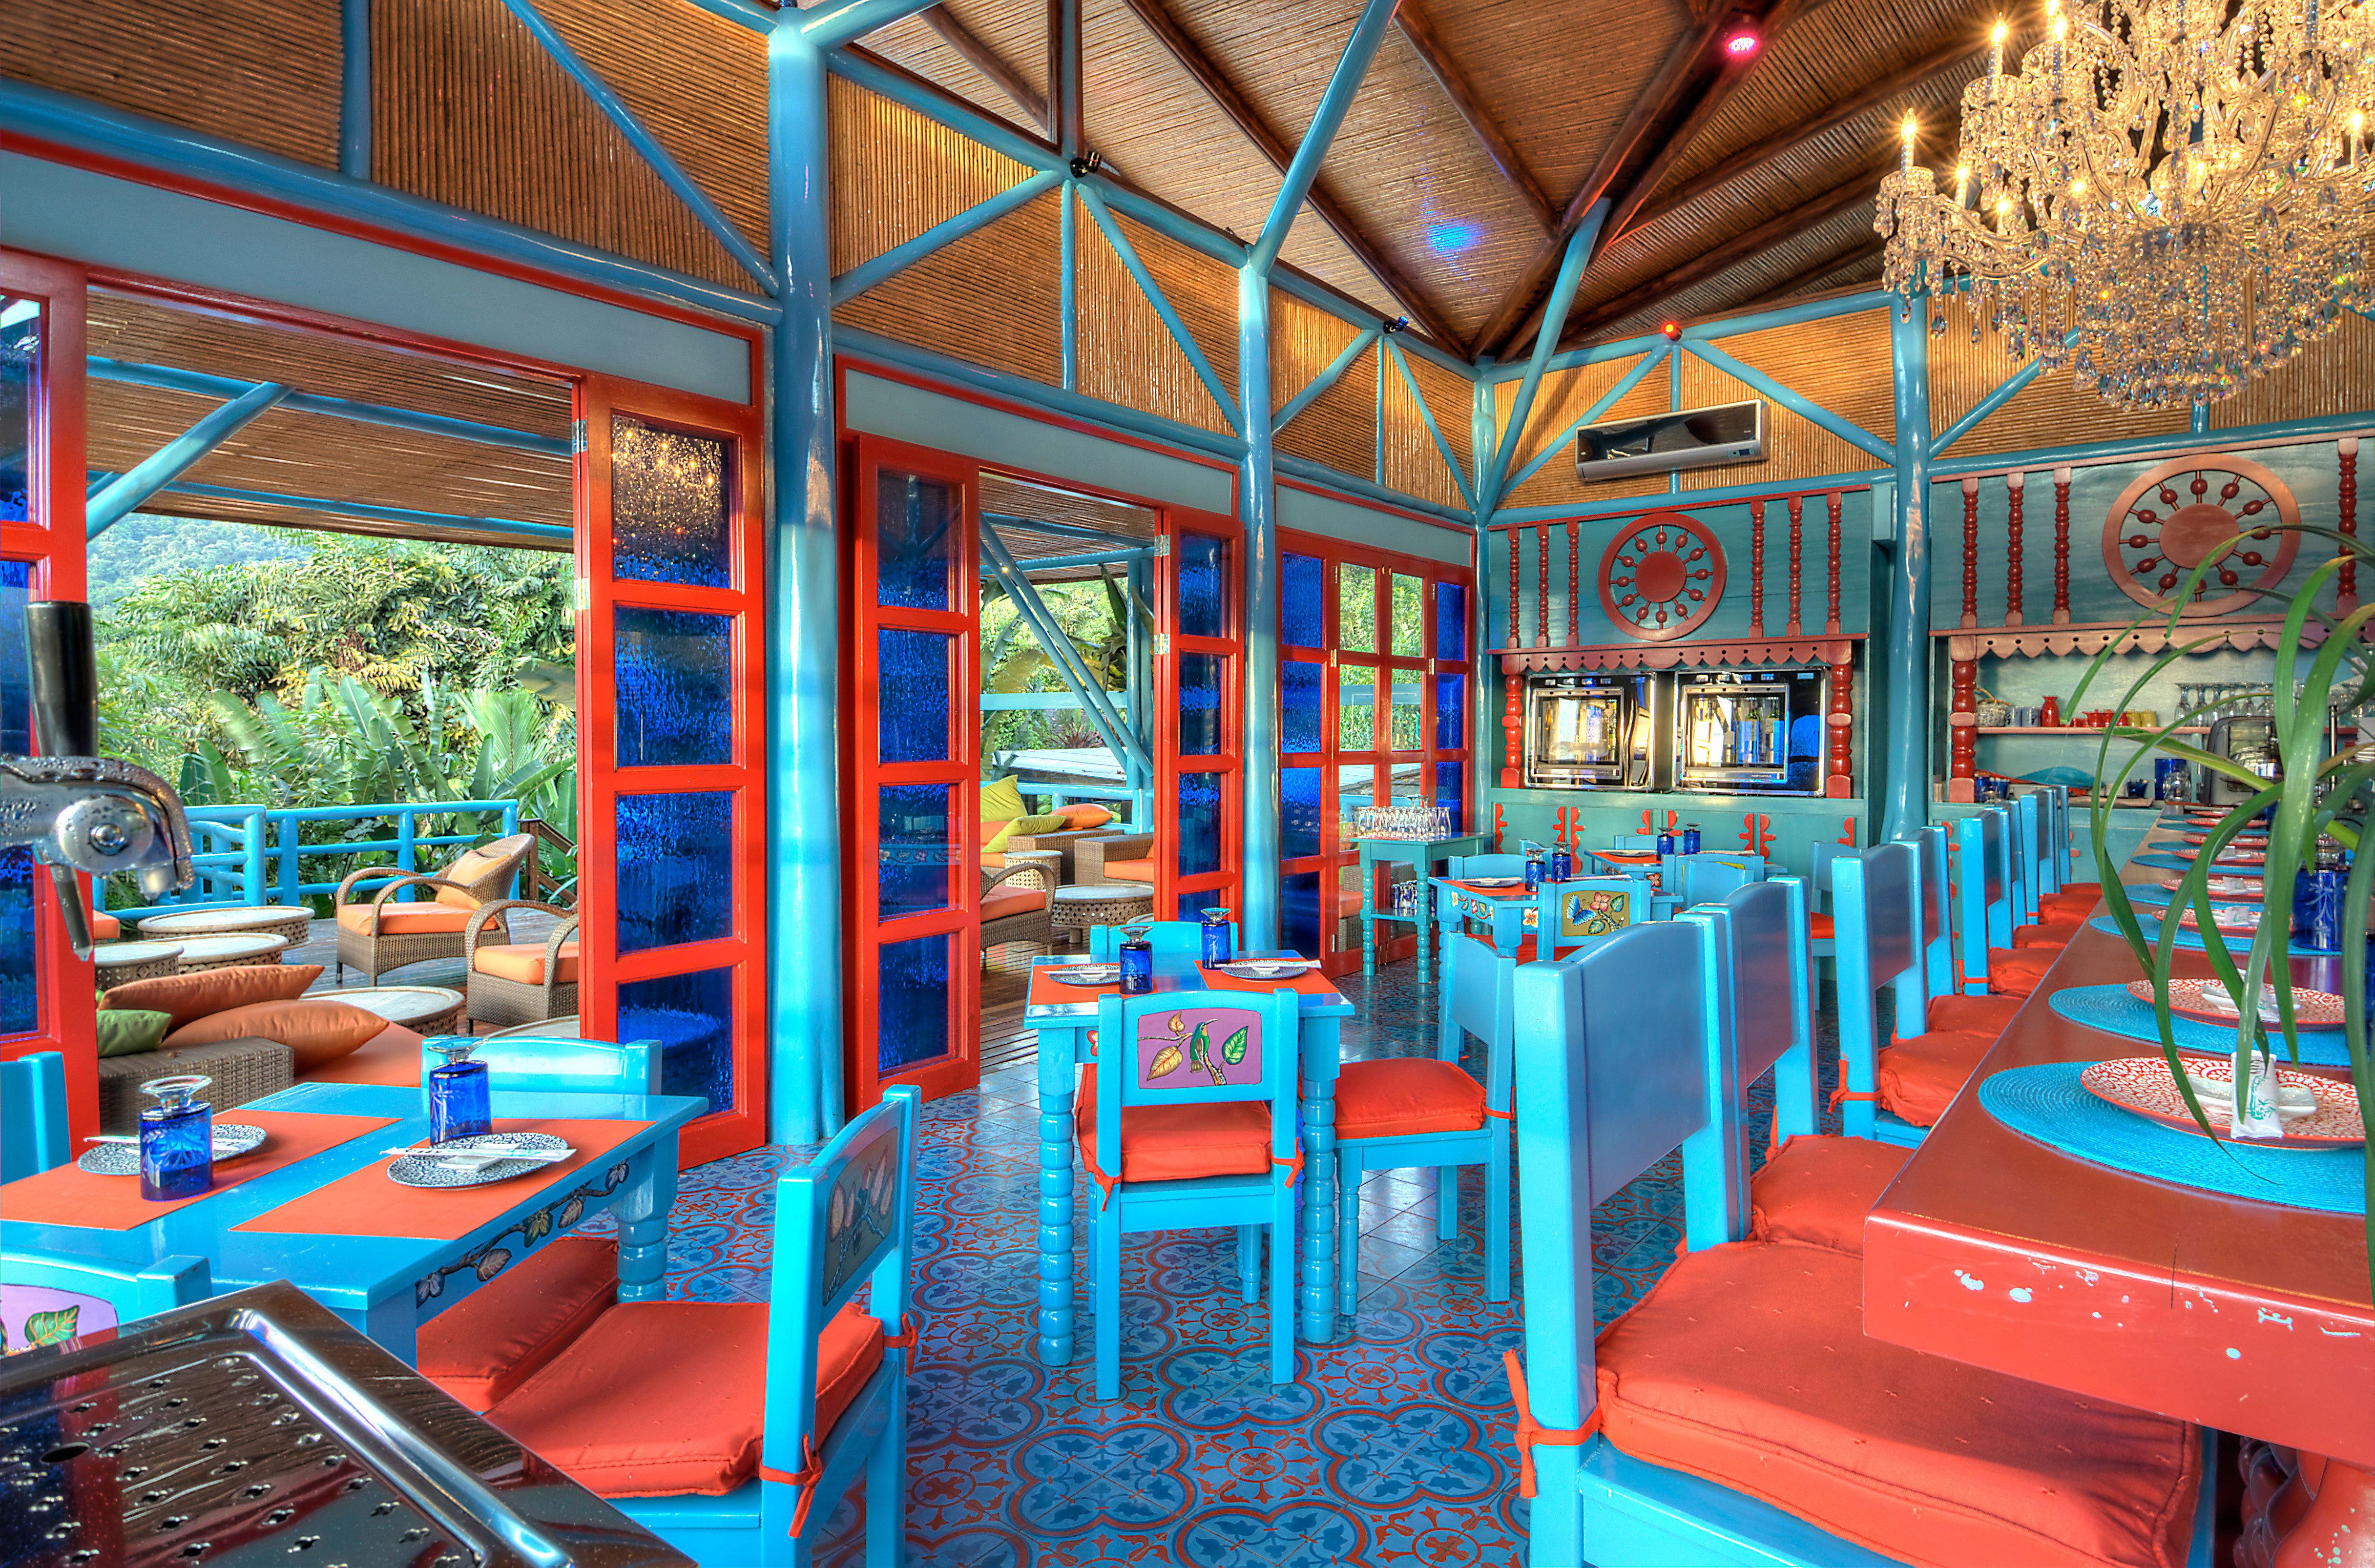 Country Dining Drink Eat Eco Jungle Romantic Rustic chair leisure restaurant amusement park Resort colorful orange set colored